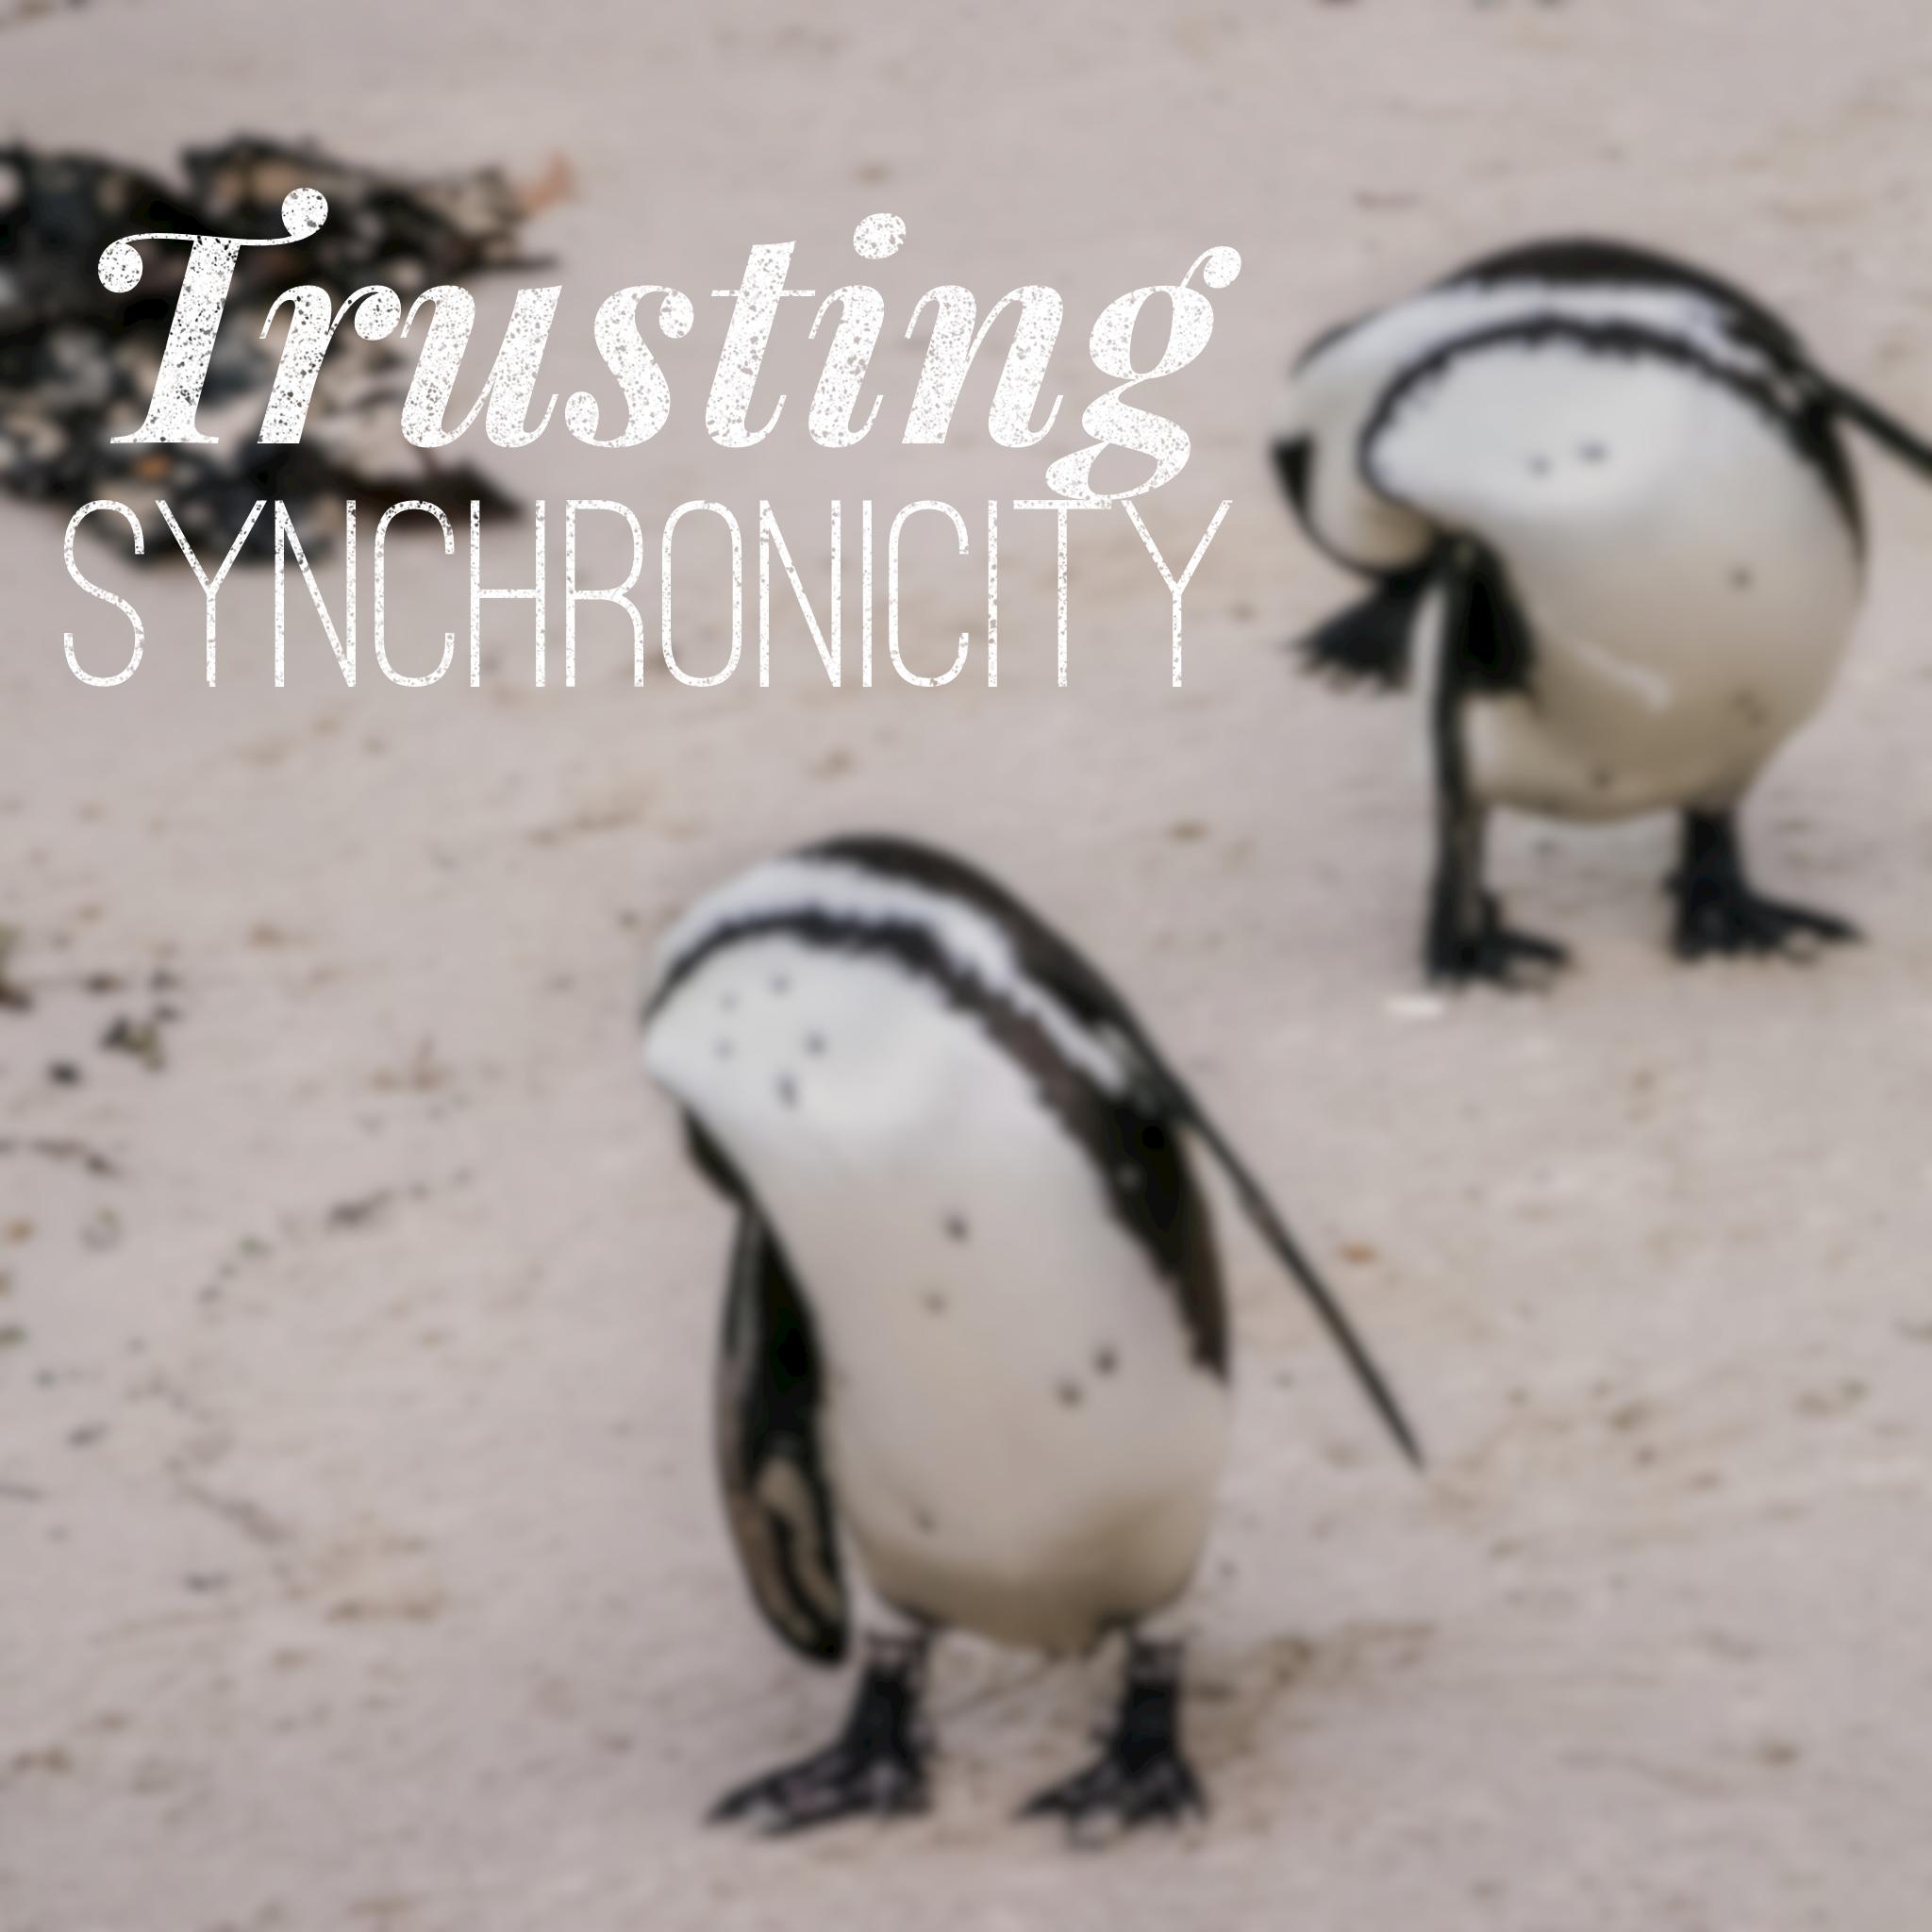 trusting synchronicity